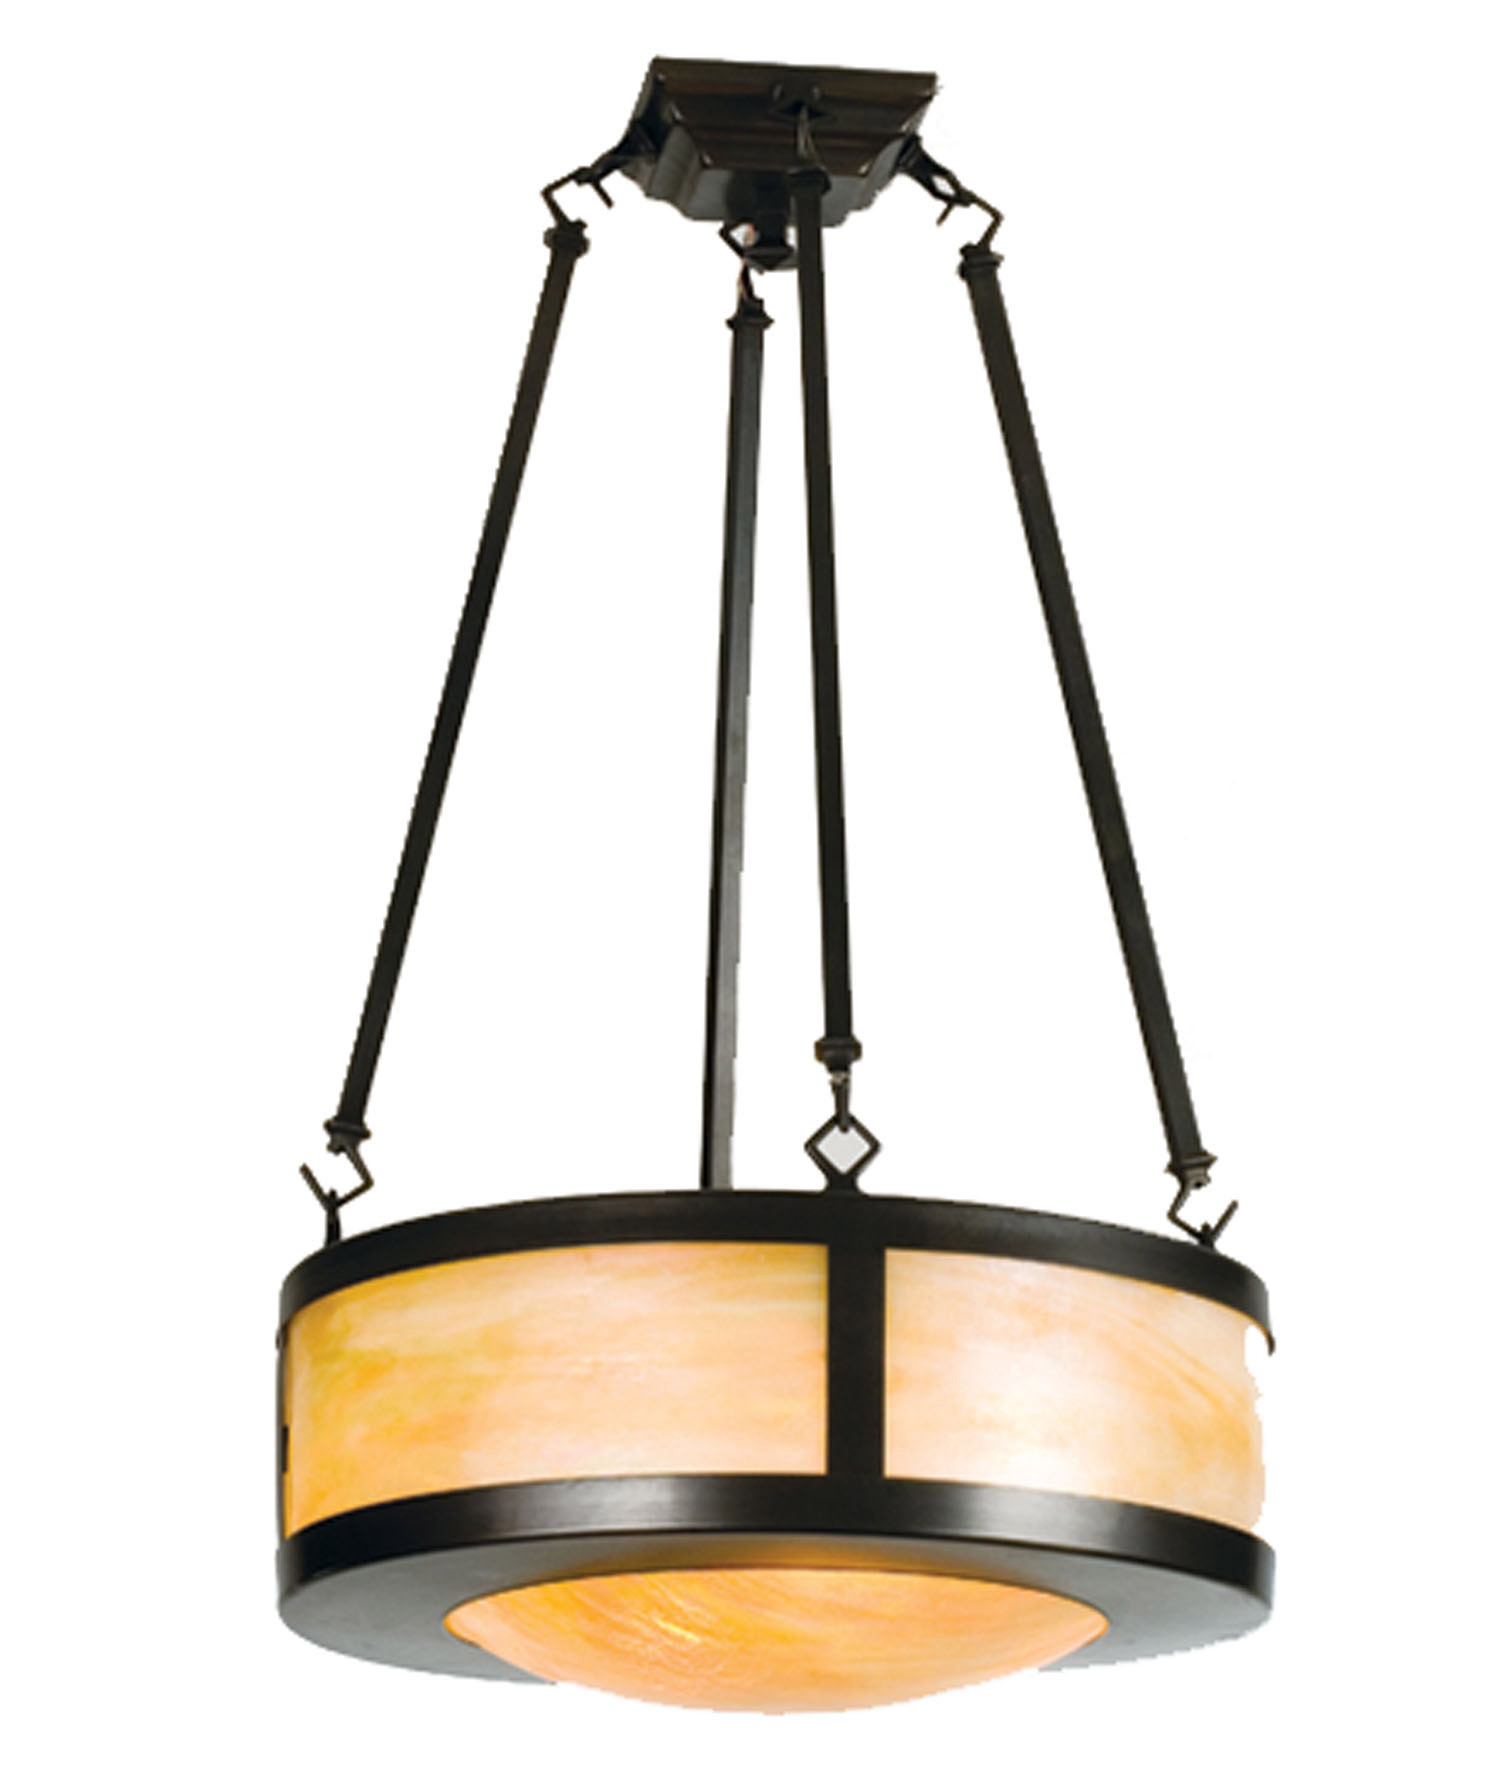 Meyda 23787 arts crafts semi flush ceiling fixture for Arts and crafts flush mount lighting